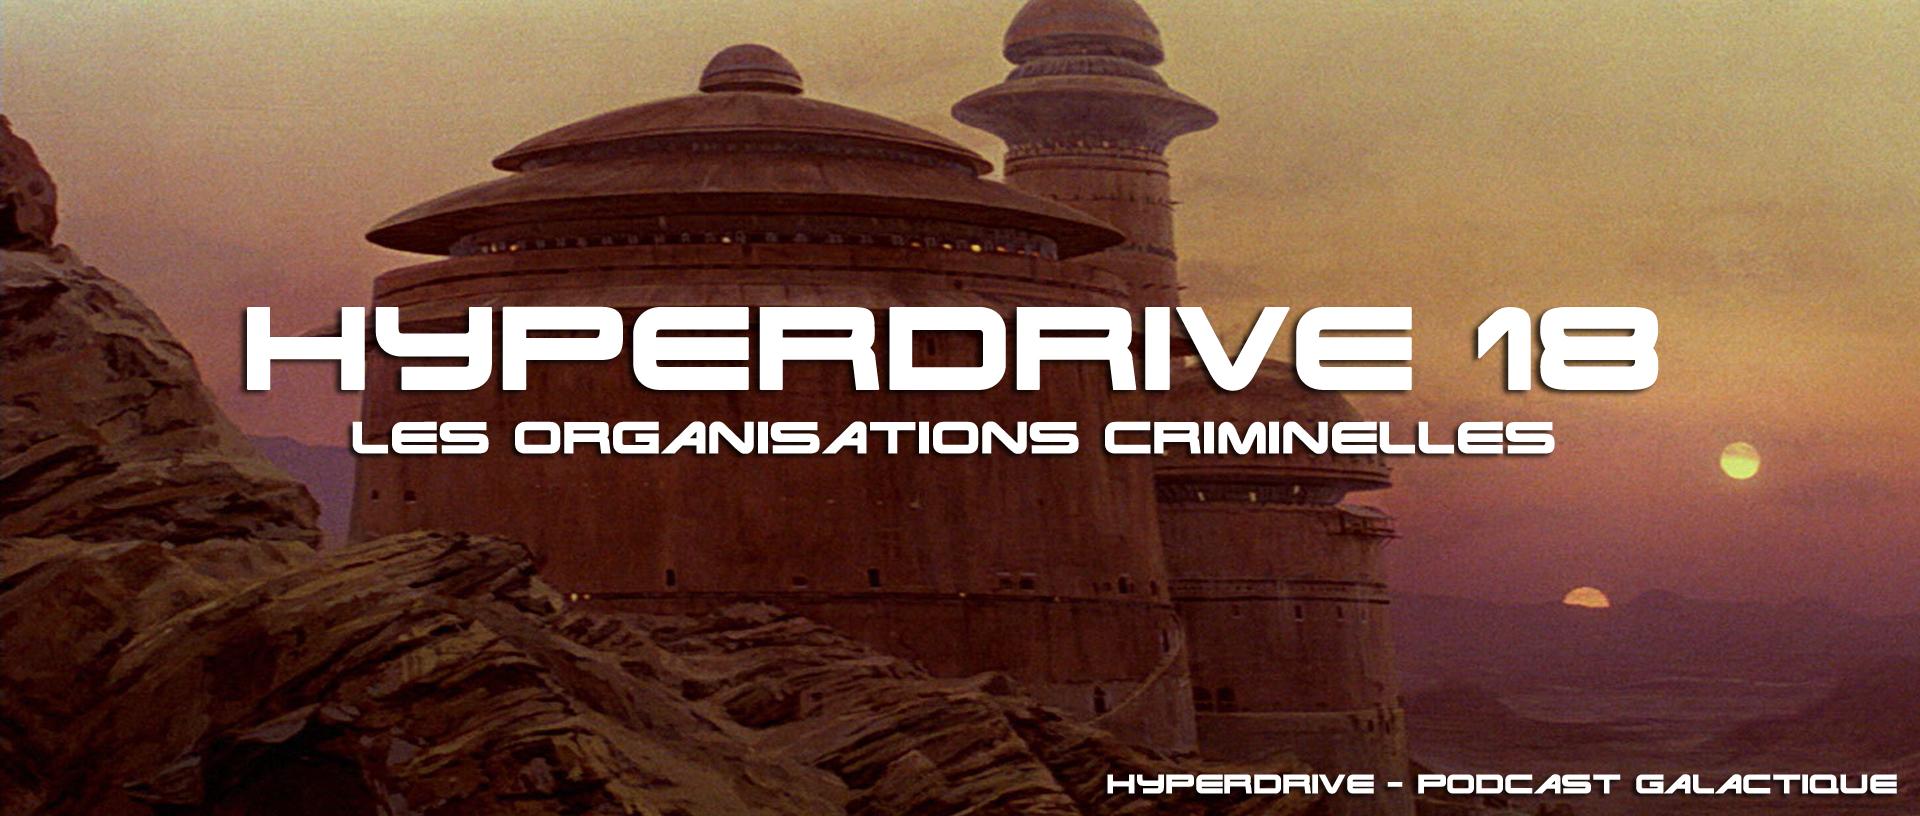 les organisations criminelles dans Star Wars